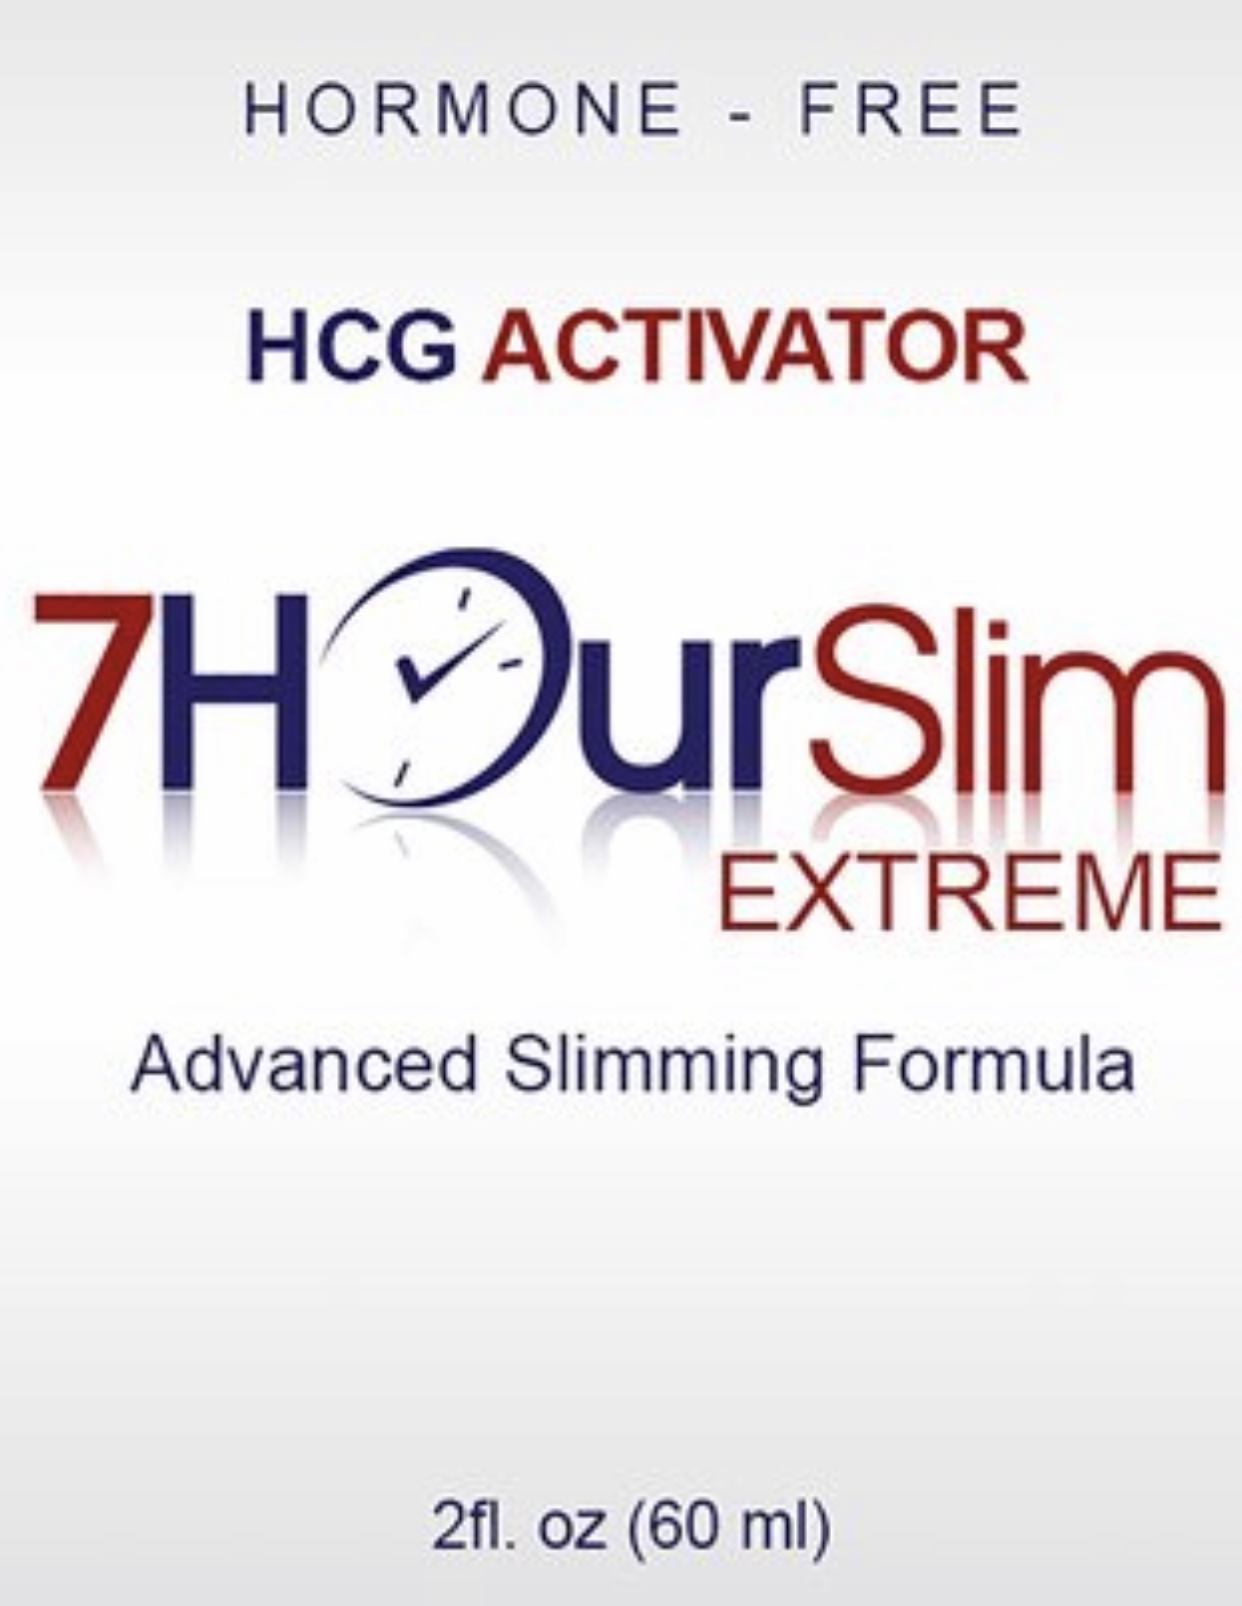 7 Hour Slim HCG Activator